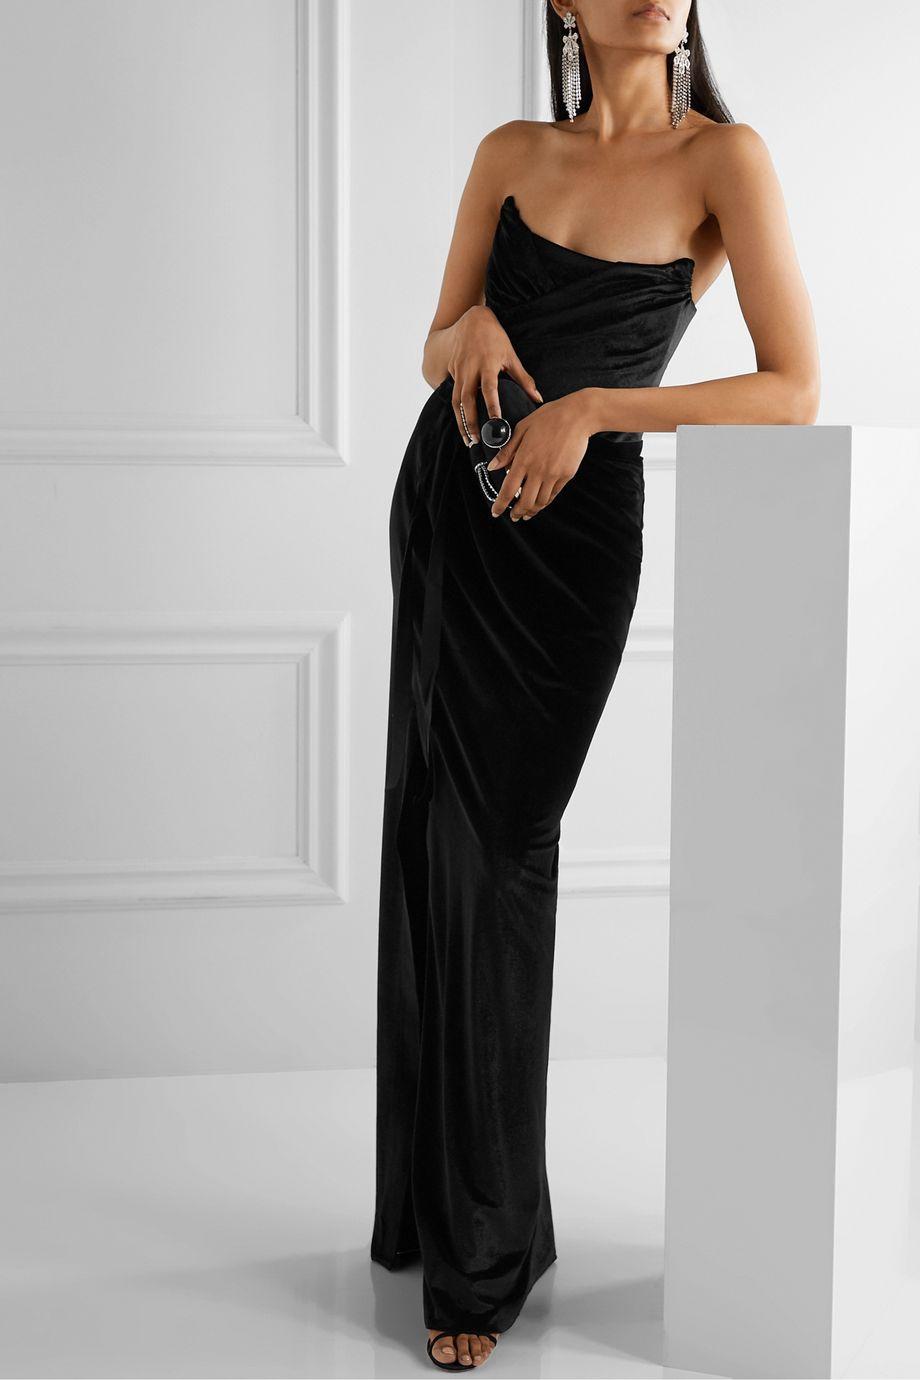 Marchesa Notte Strapless velvet gown